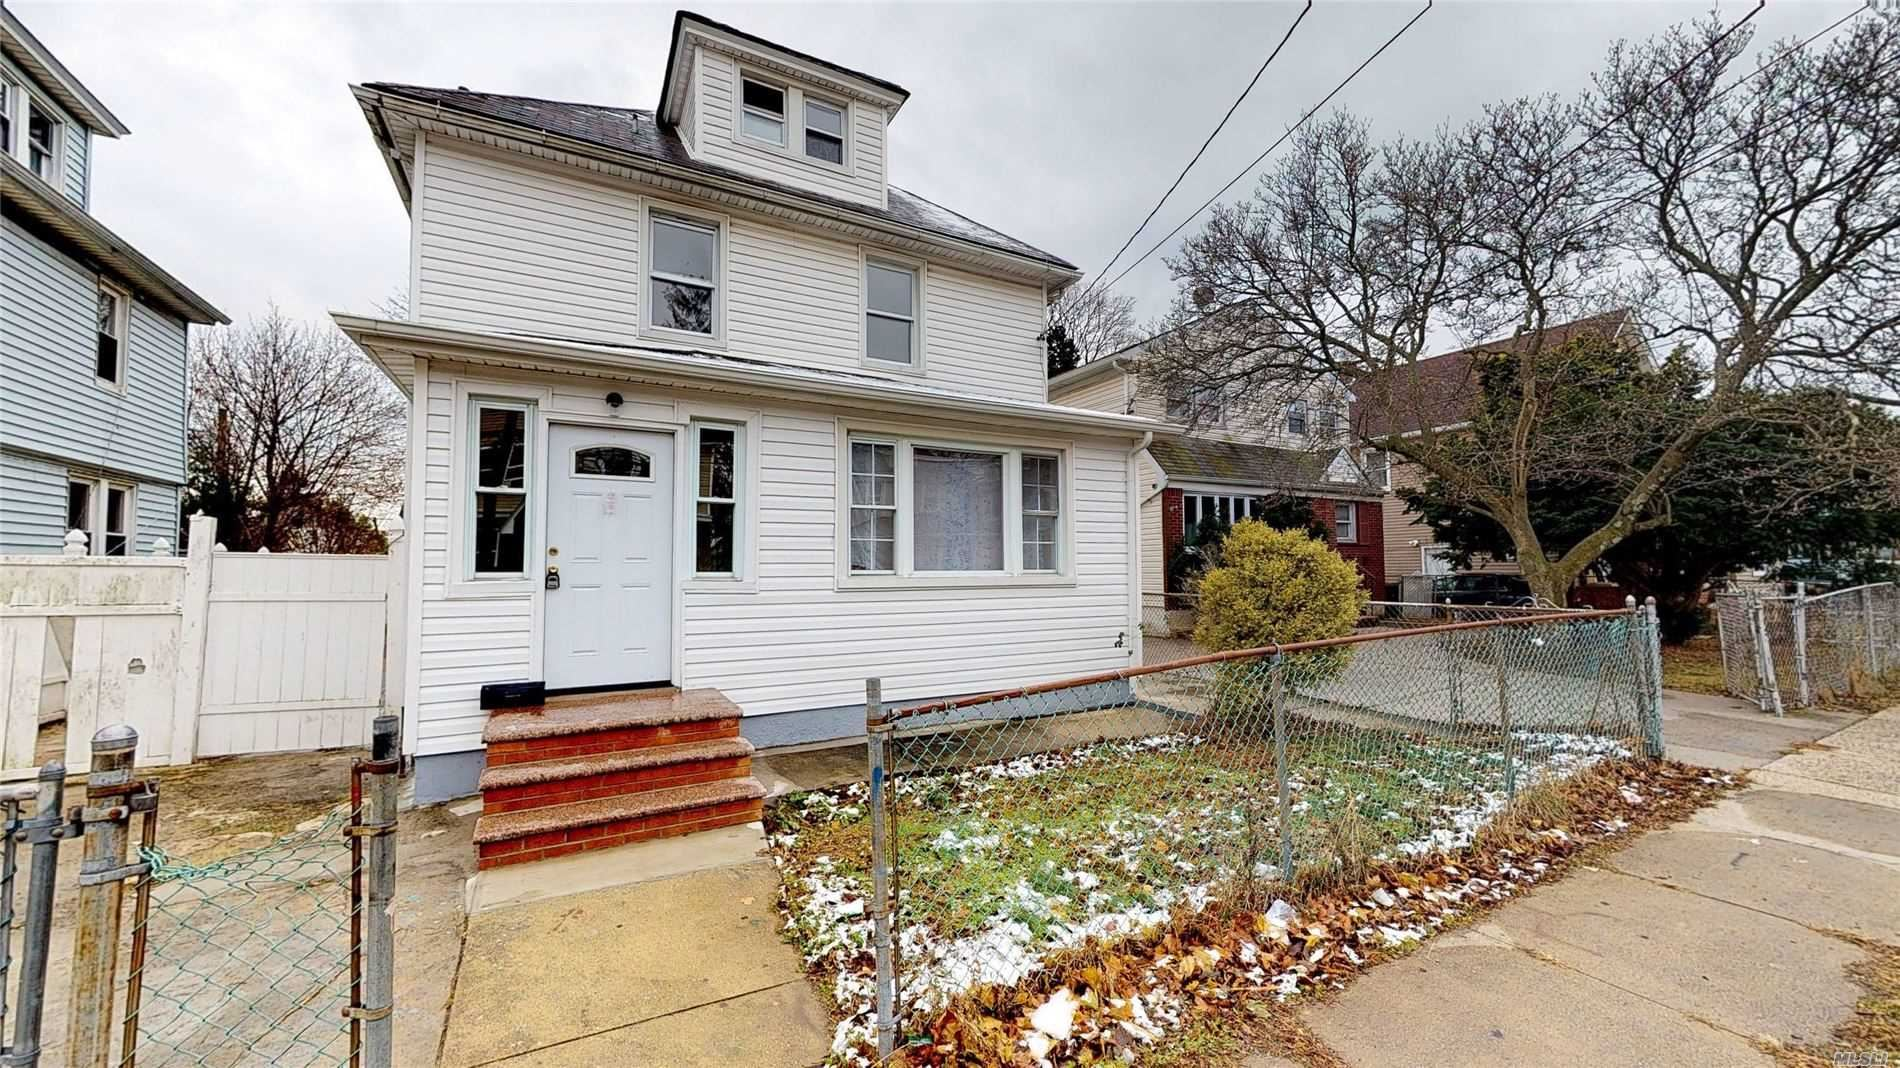 36 Miller Place, Hempstead, NY 11550 - MLS#: 3185770